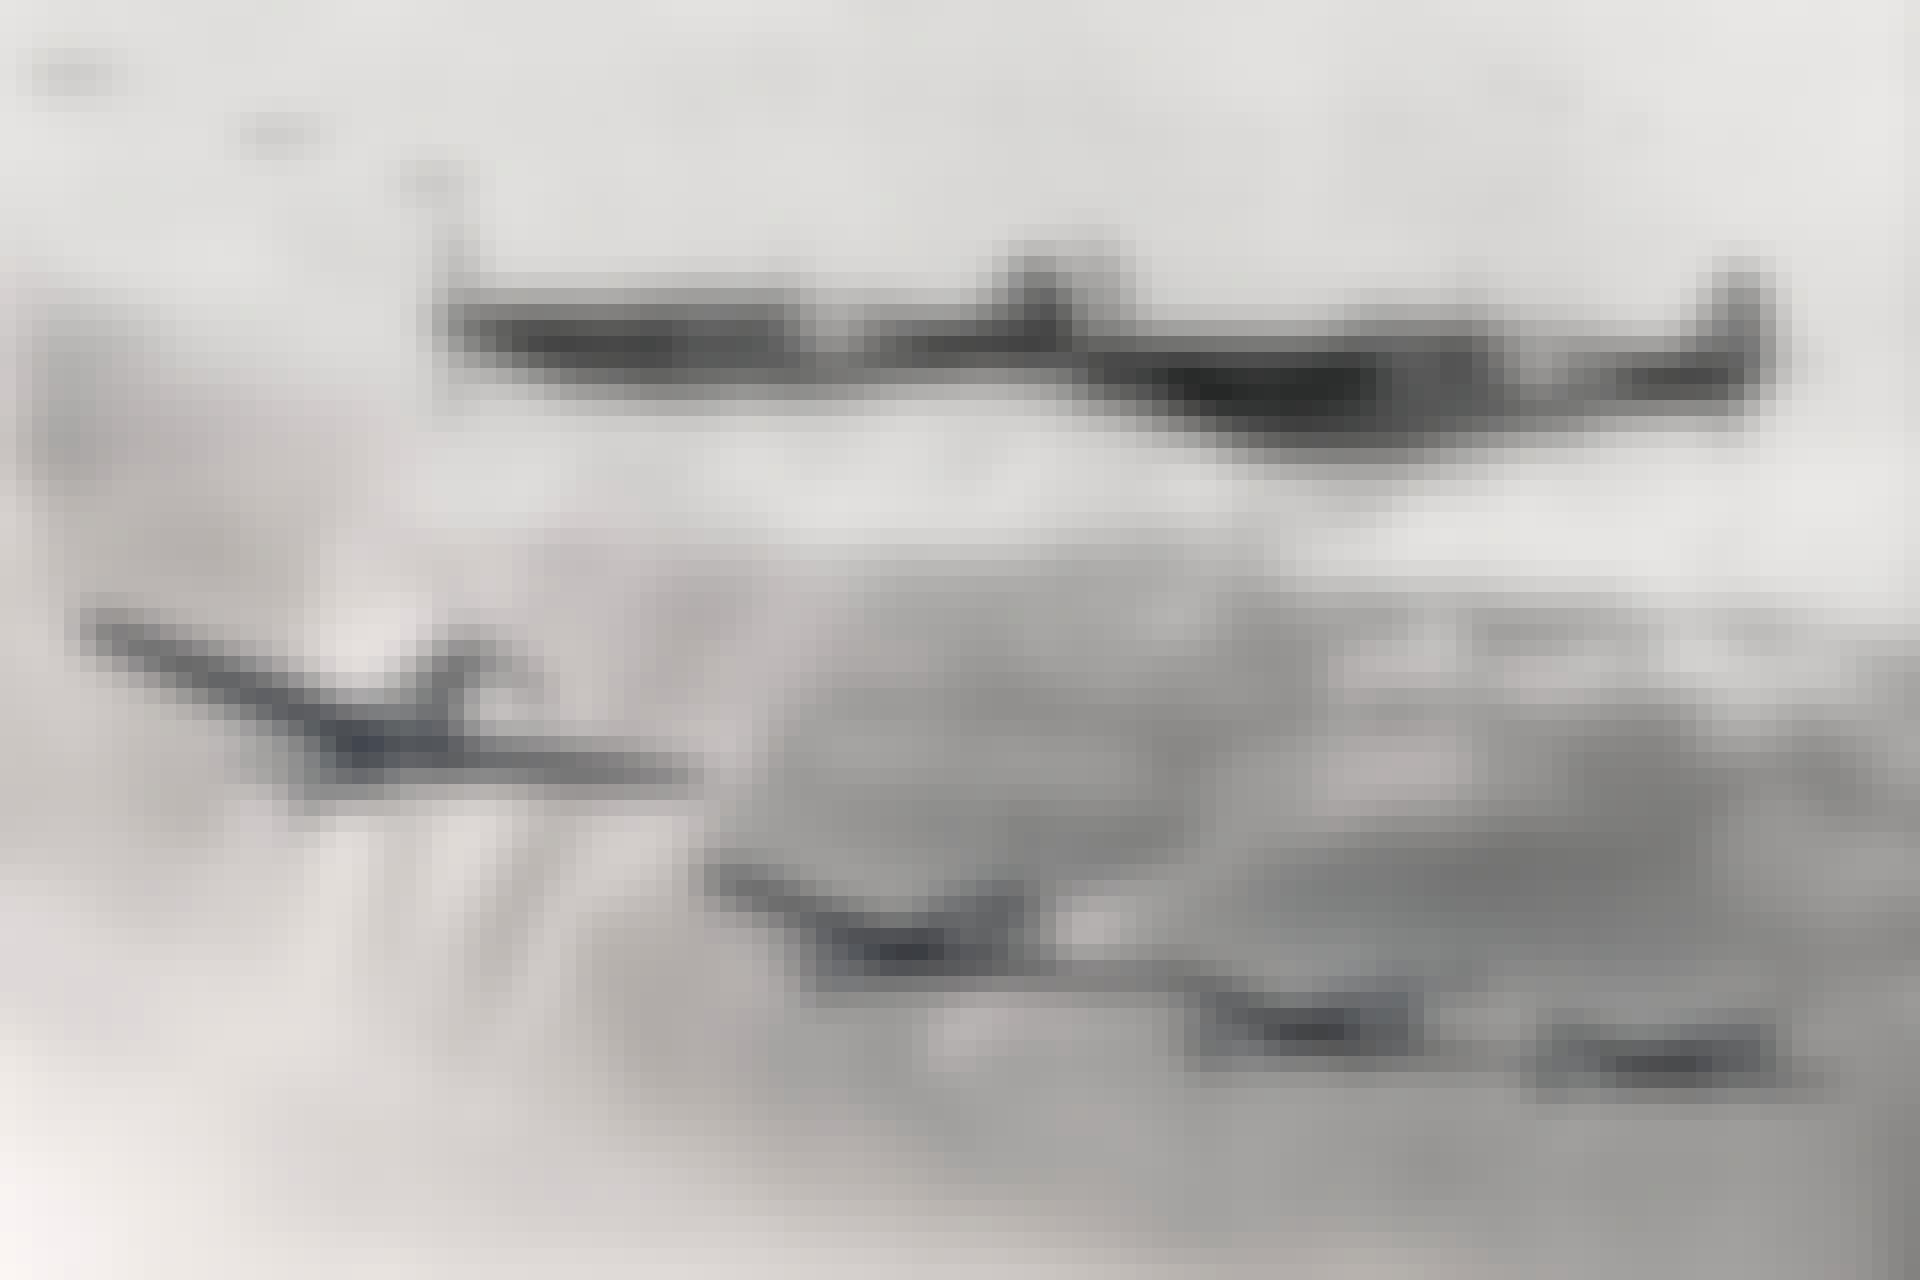 Slaget om Storbritannien, spitfire Mk IA mot Messerschmitt Bf 109.